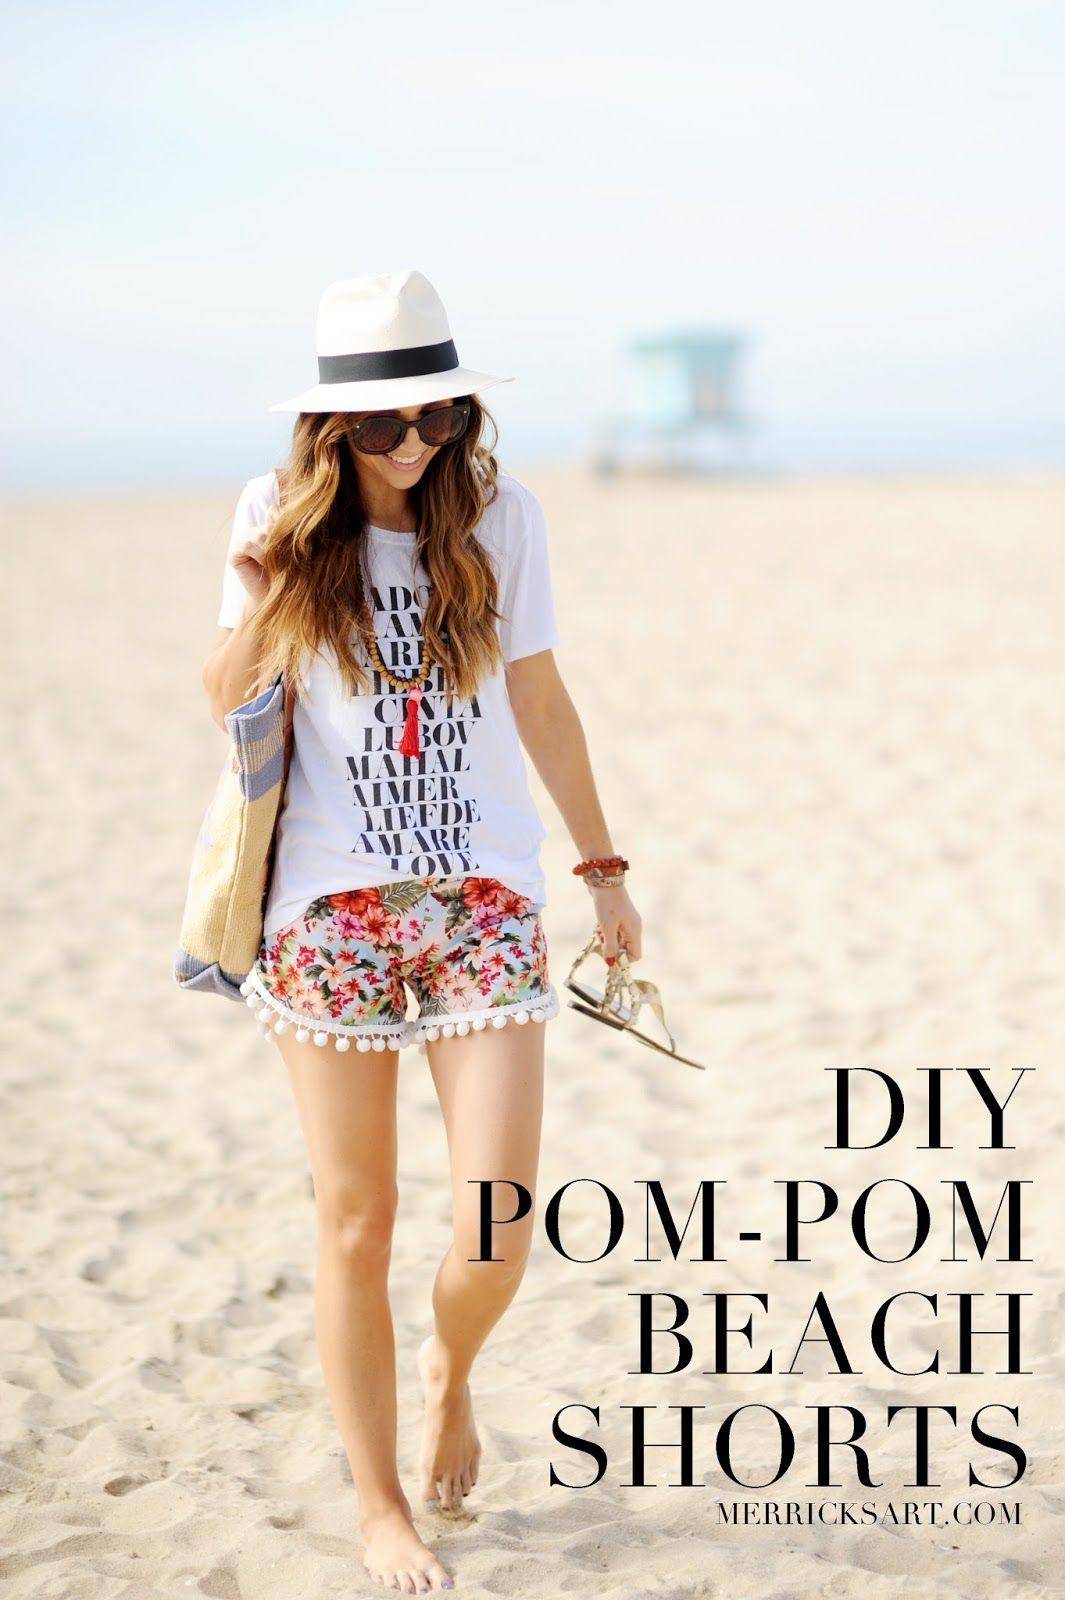 DIY FRIDAY: POM-POM BEACH SHORTS (Merrick\'s Art) | diy. | Pinterest ...